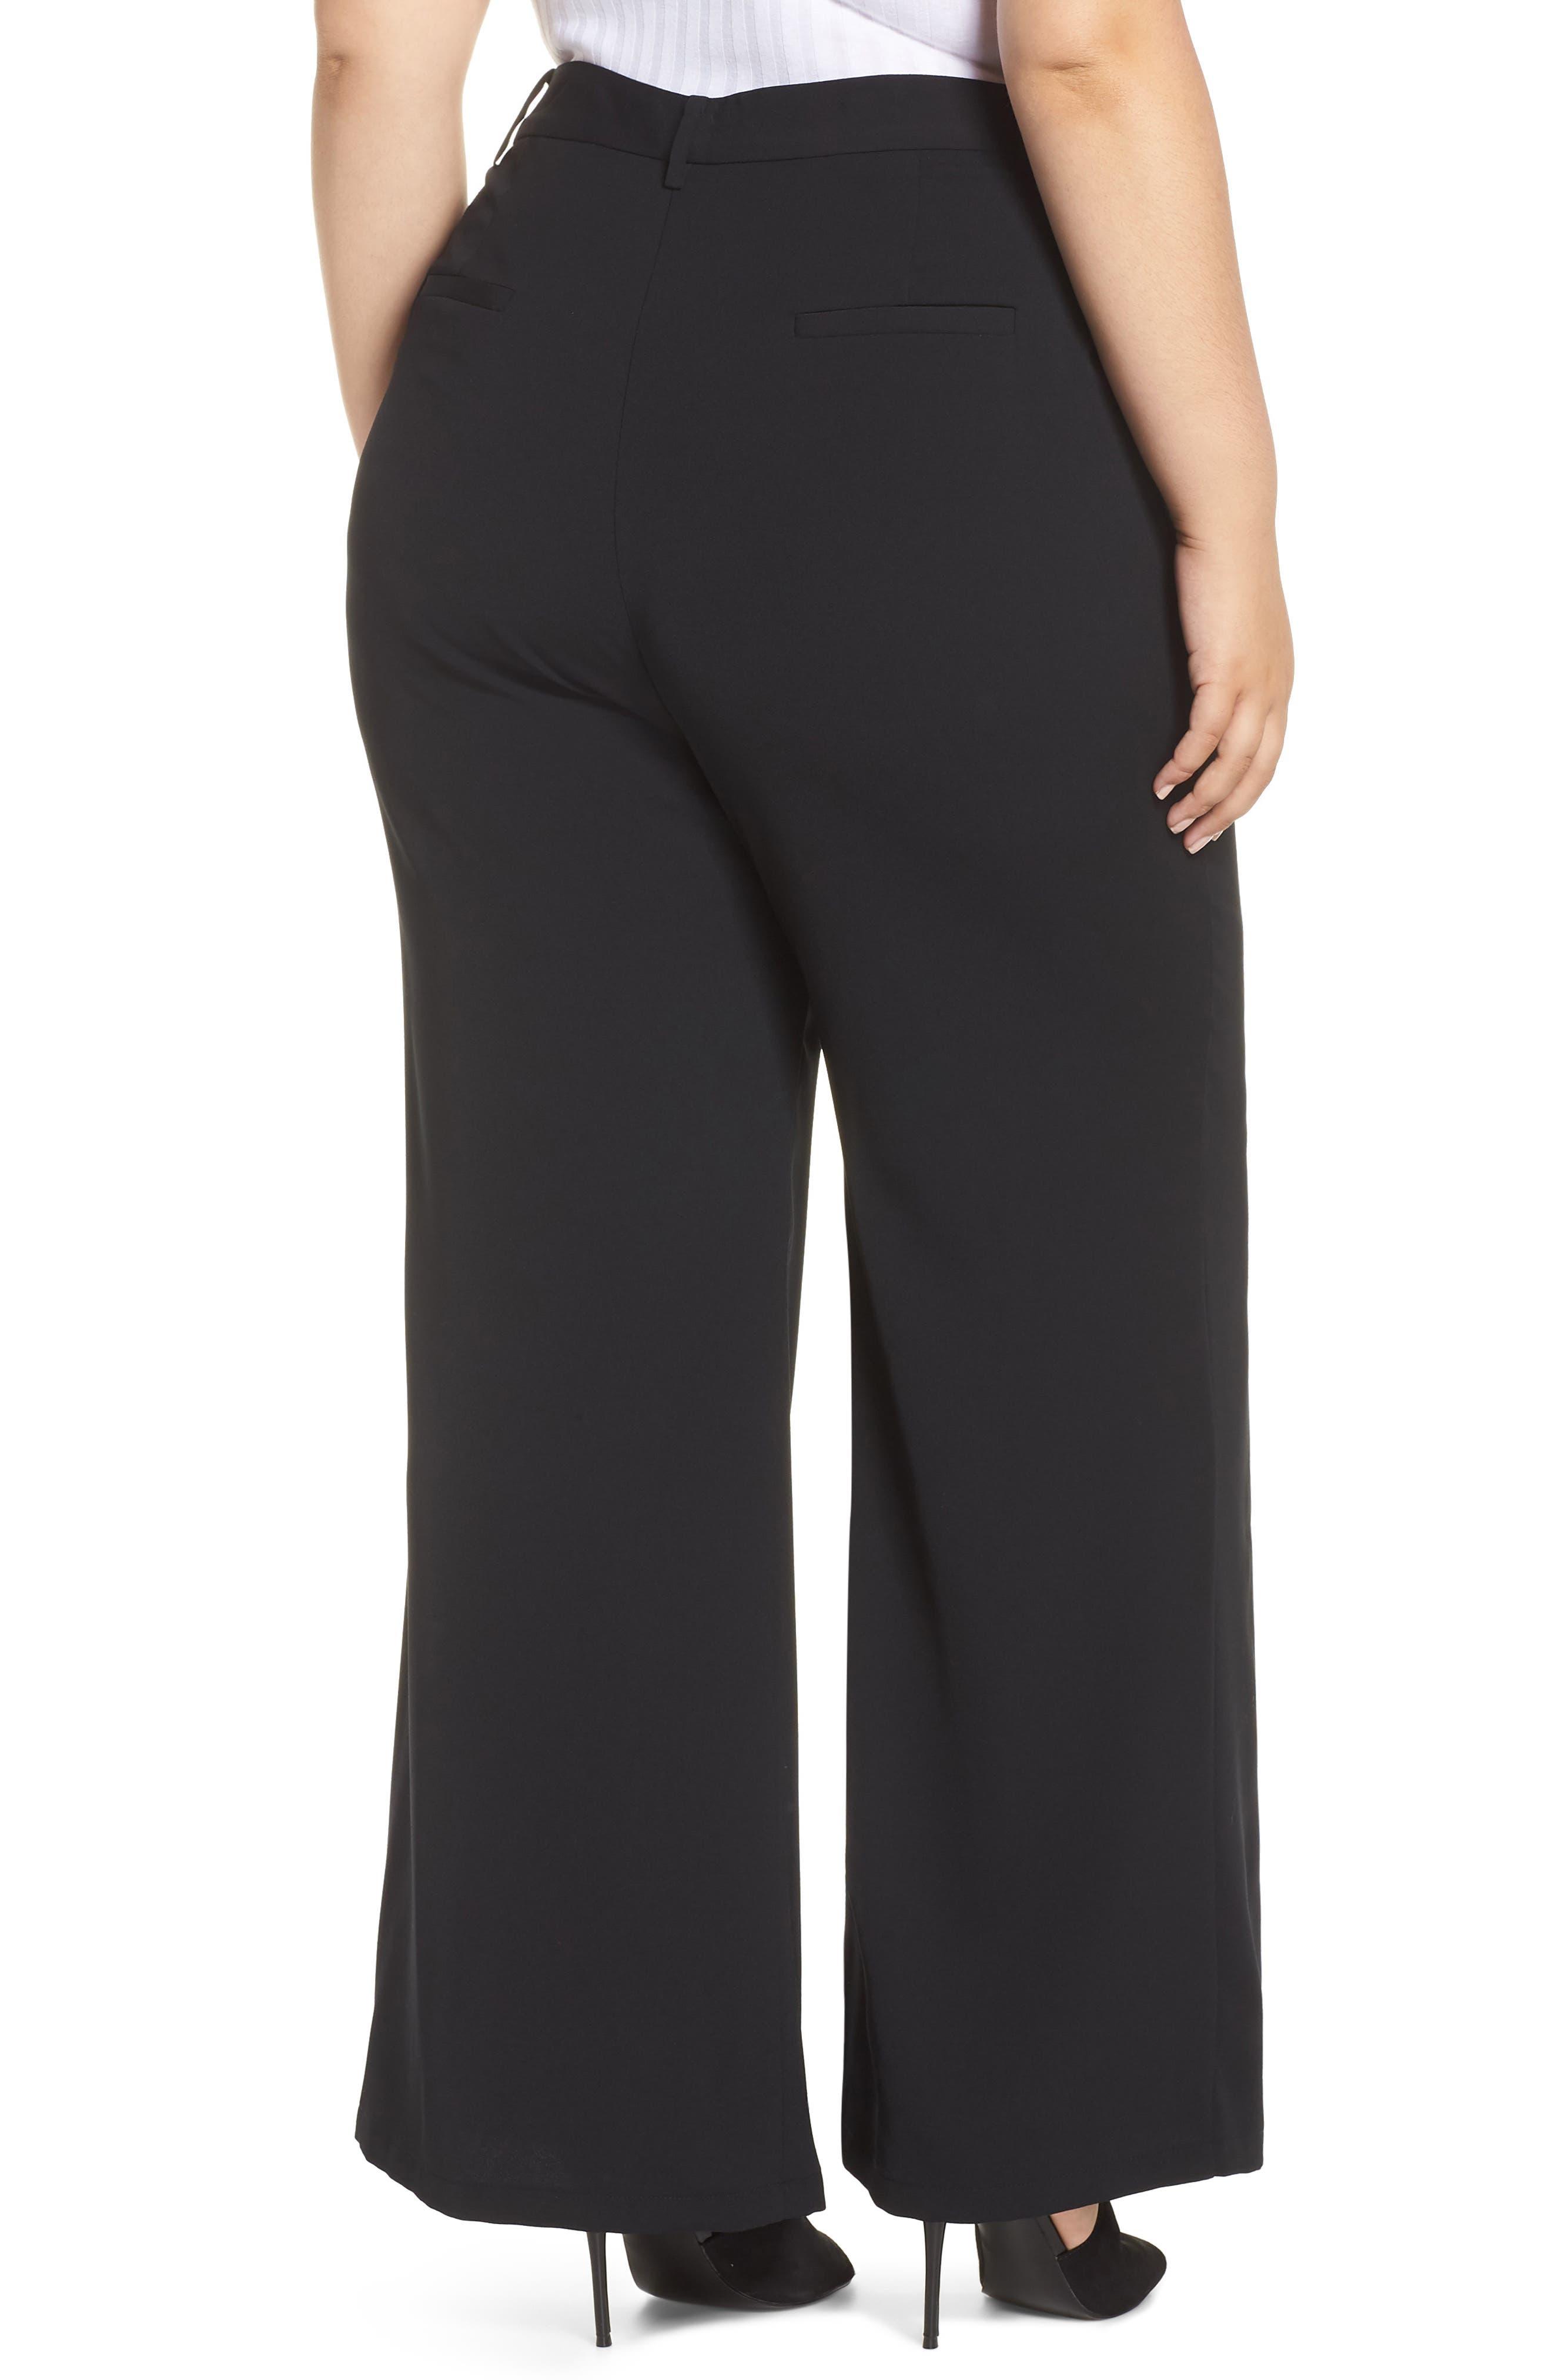 High Waist Flare Pants,                             Alternate thumbnail 9, color,                             BLACK